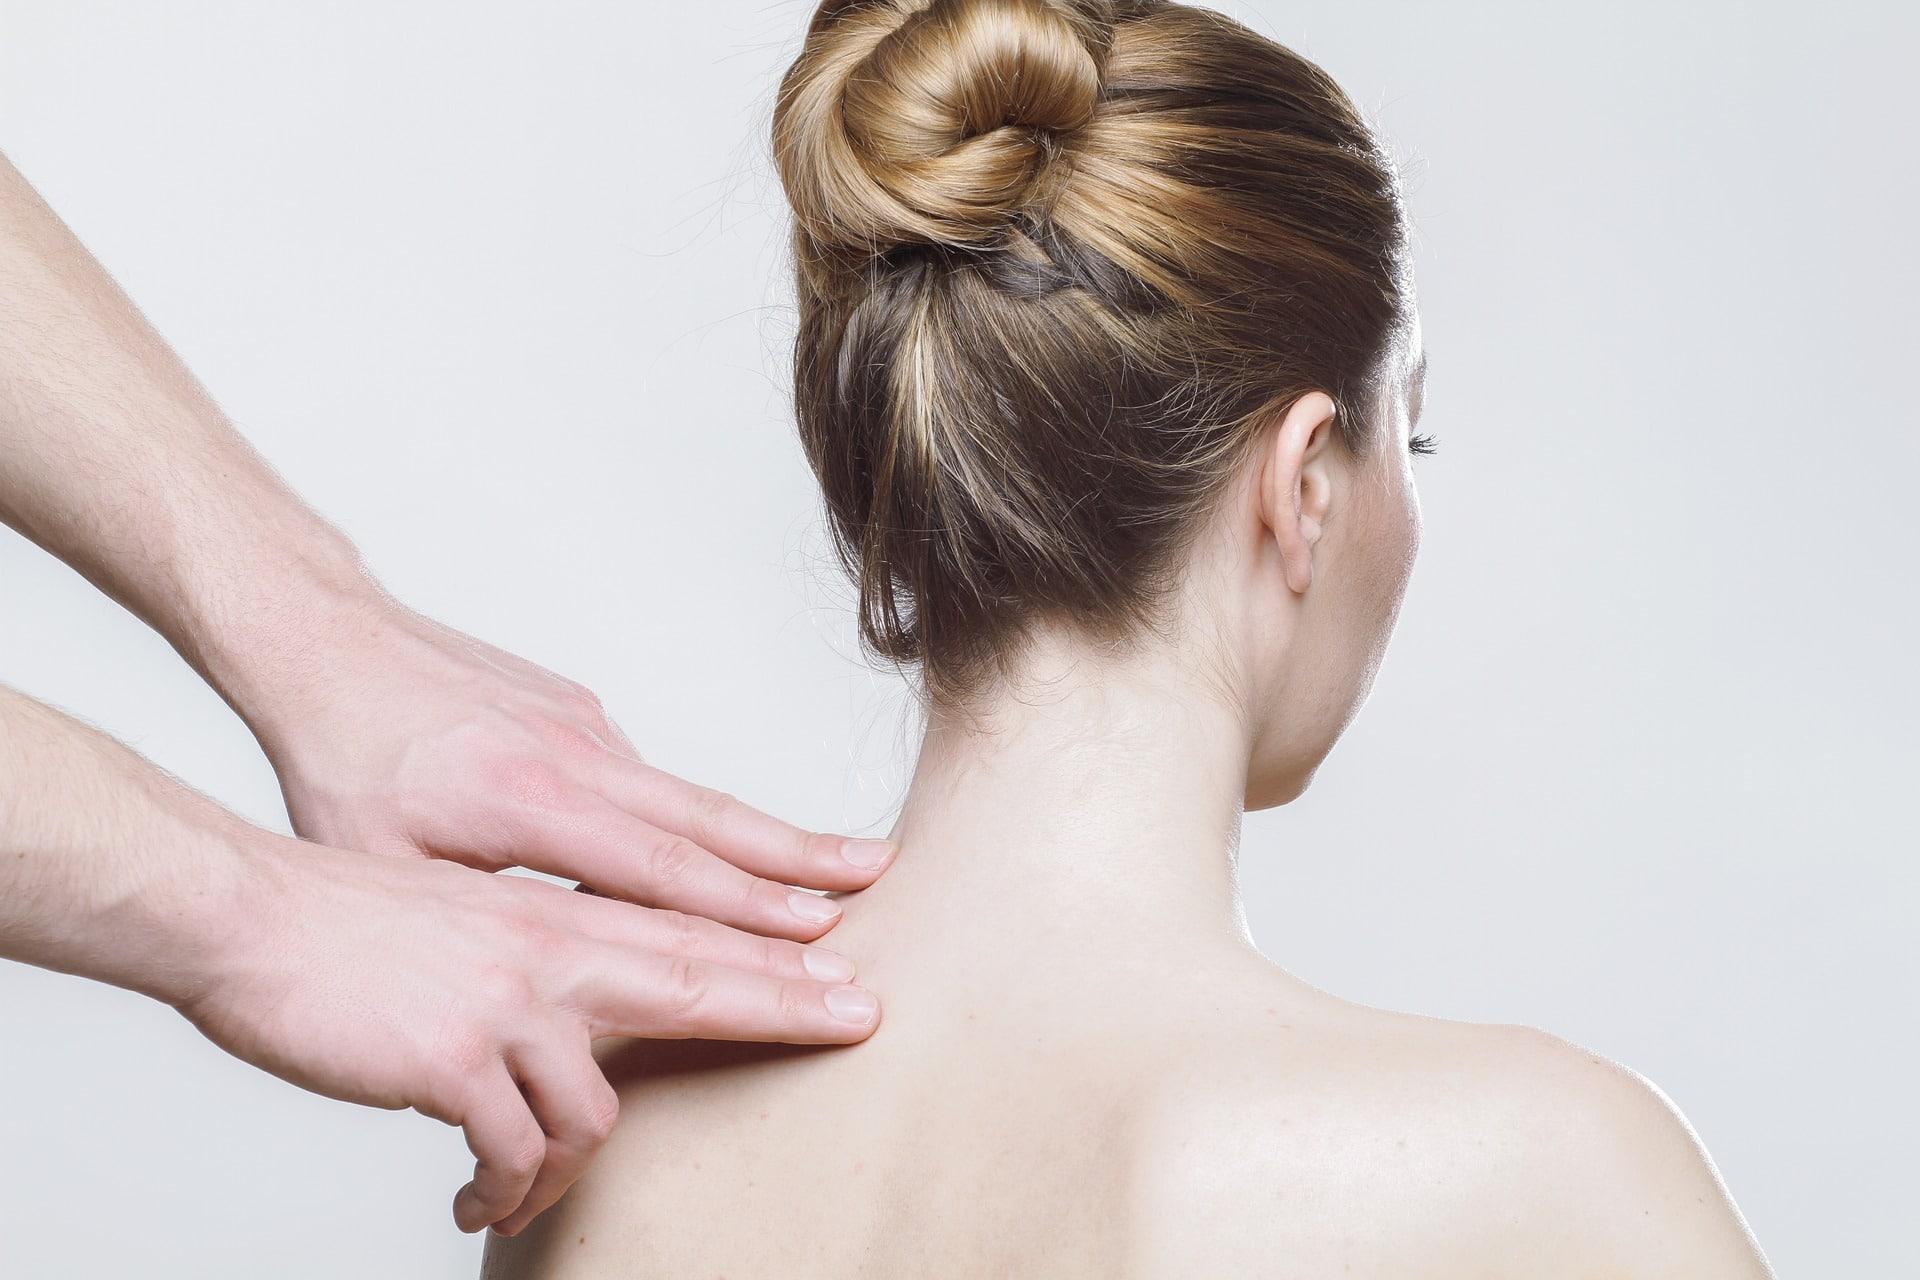 Back Pain Statistics - Women